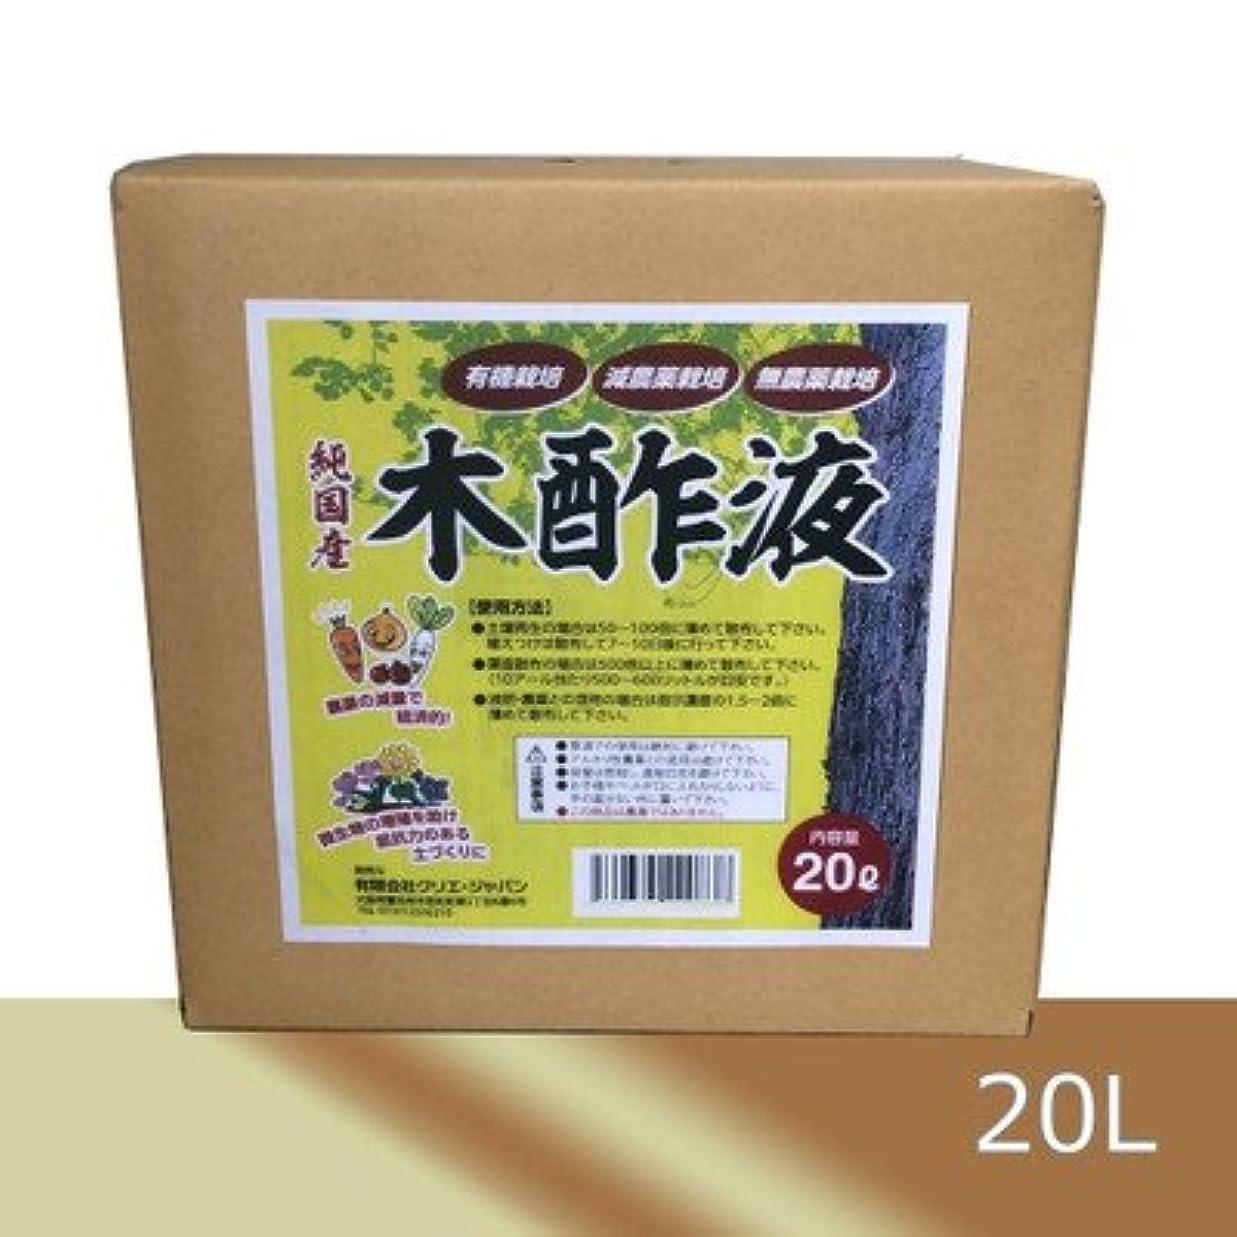 排泄物注入する禁止純国産 木酢液 20L